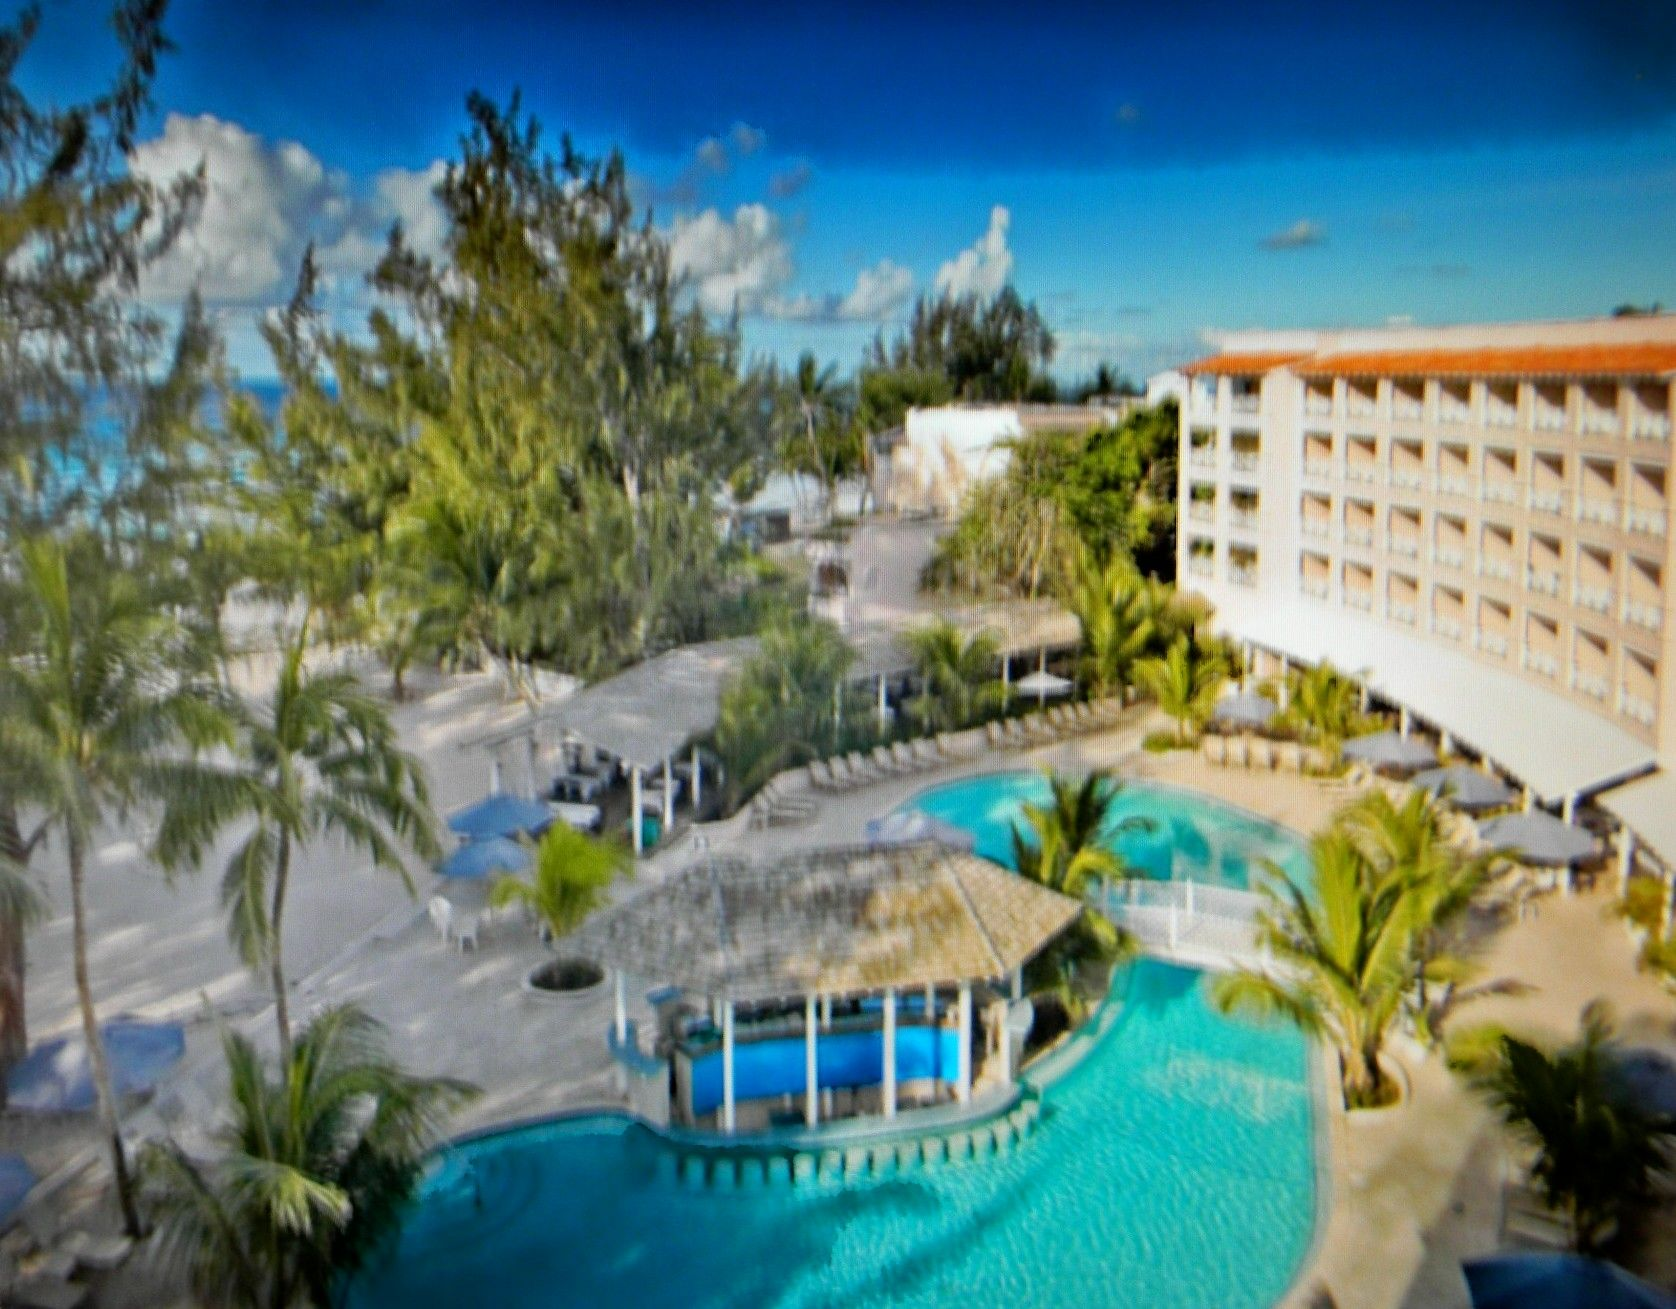 A Beautiful Caribbean Barbados Resort Almond Casuarina Beach Sponsored By Www 1great Trip